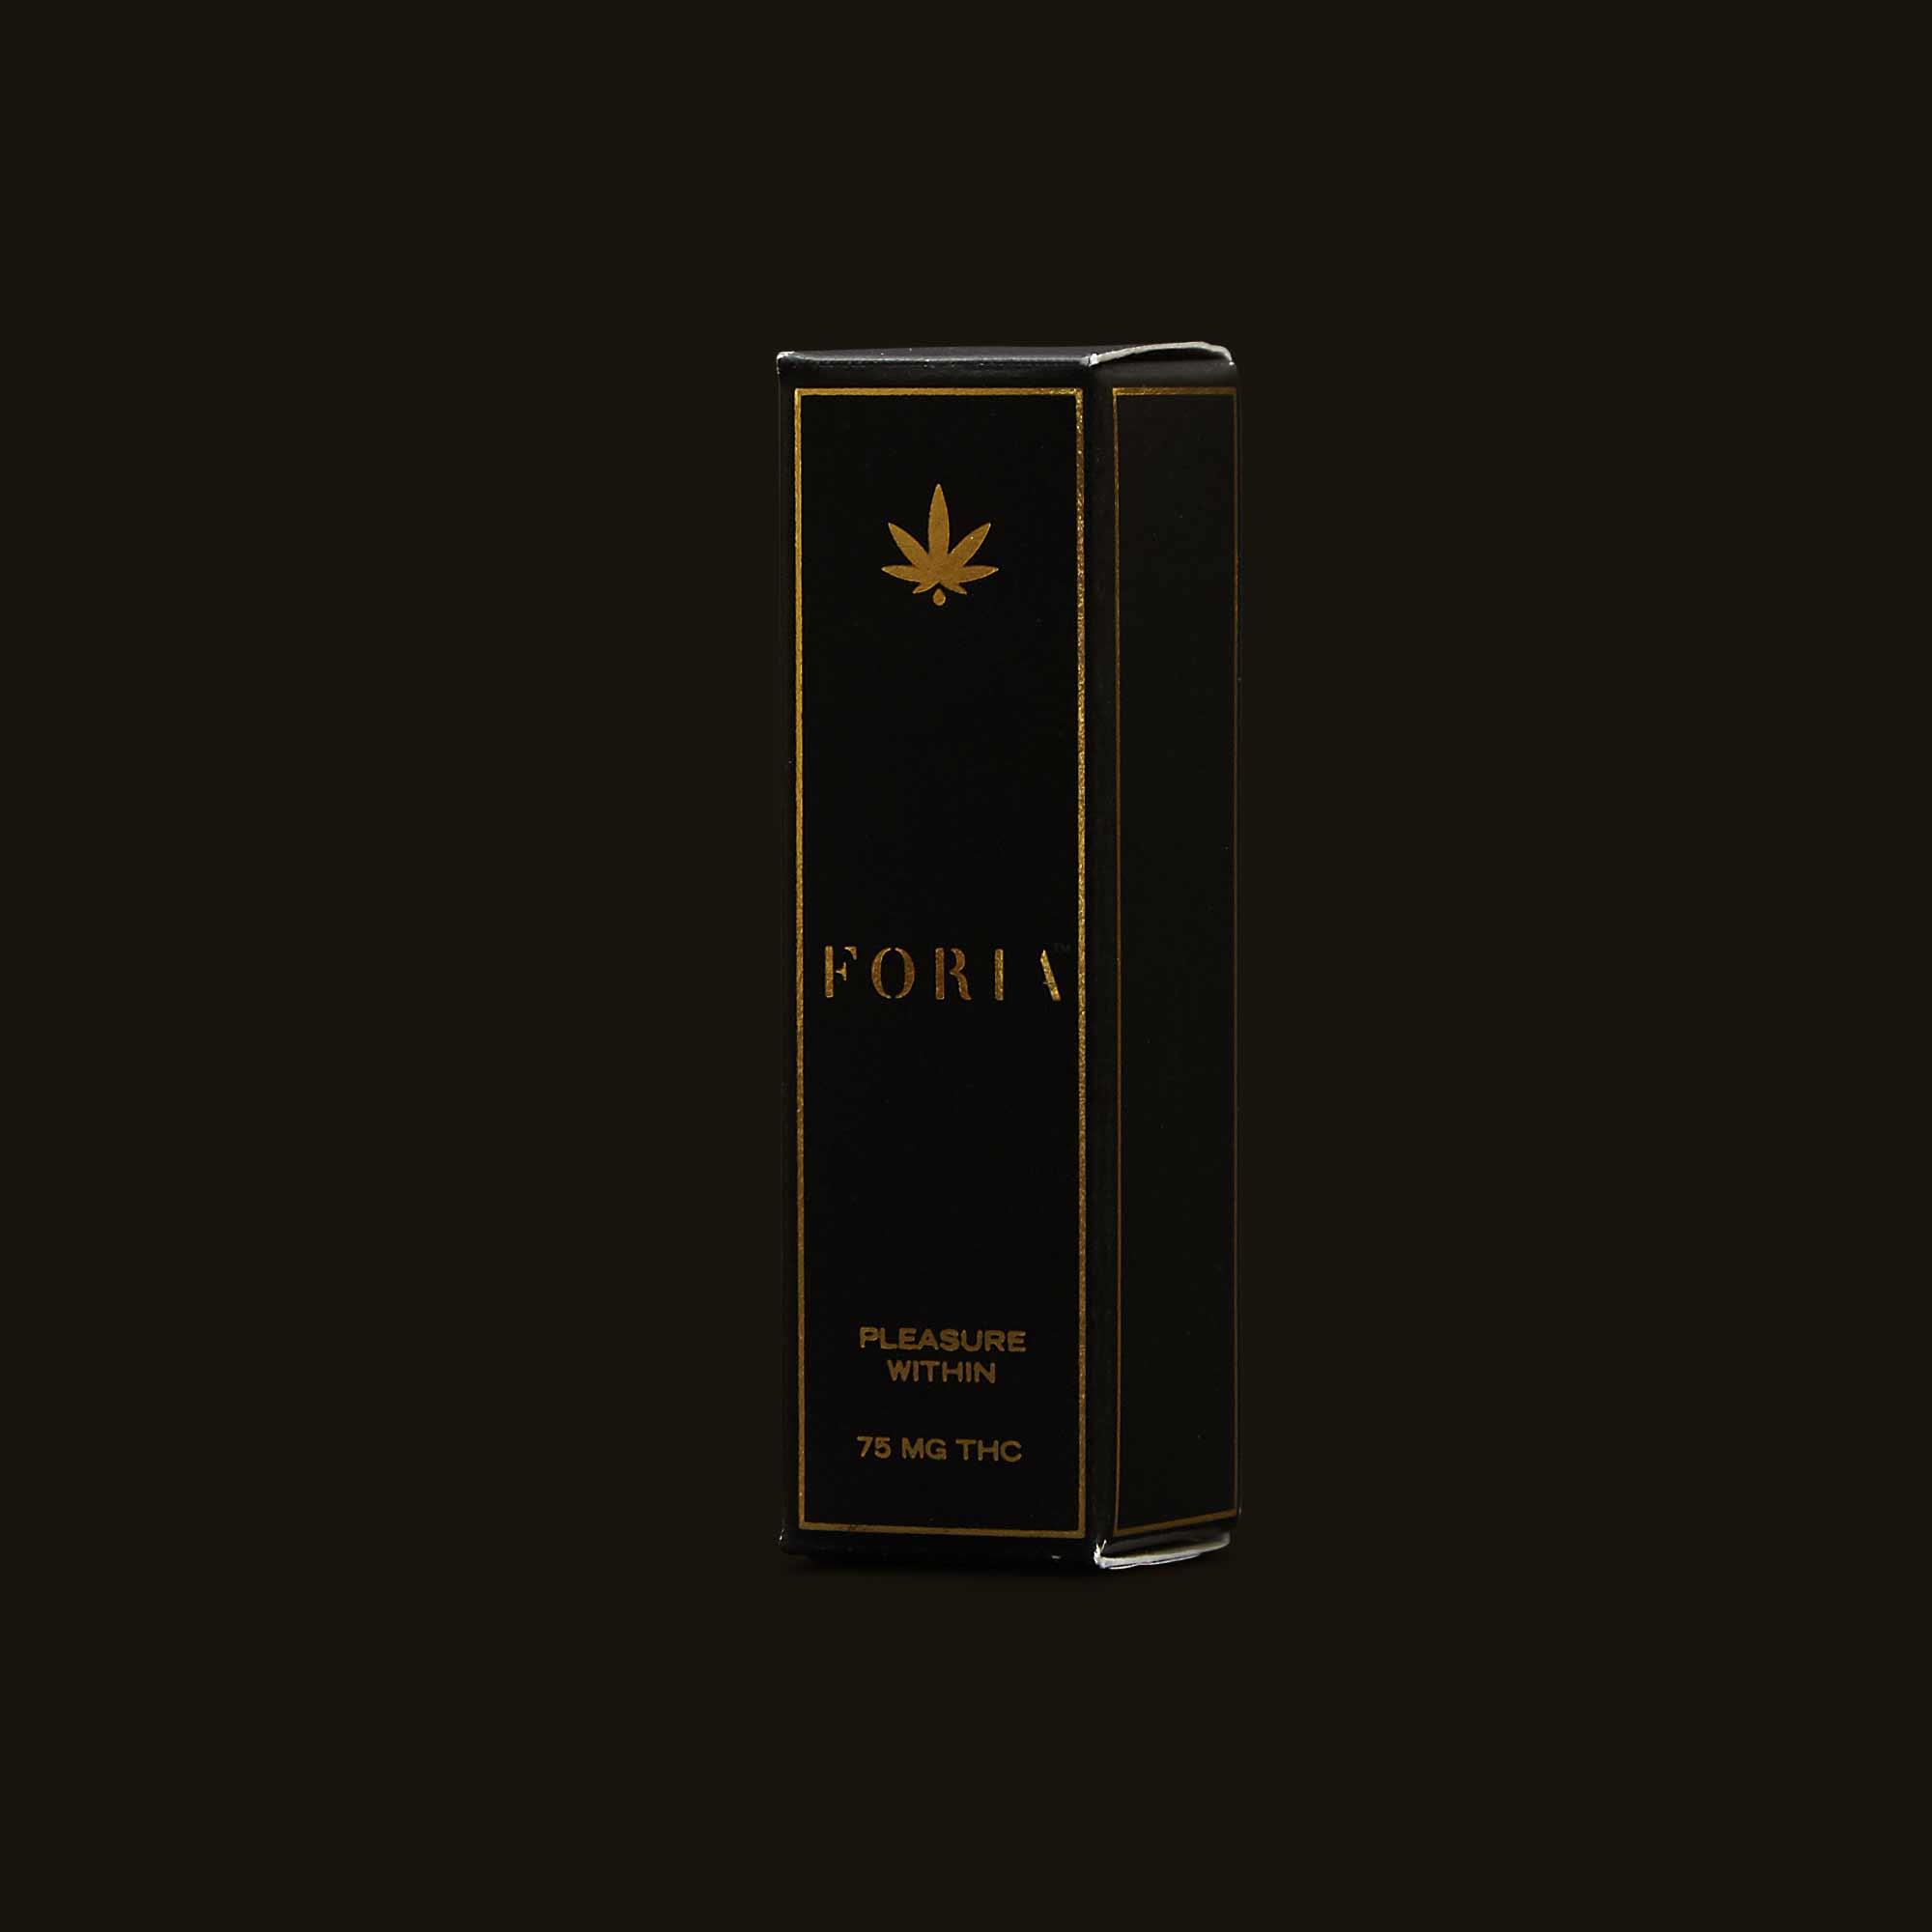 FORIA Pleasure Within - 5ml